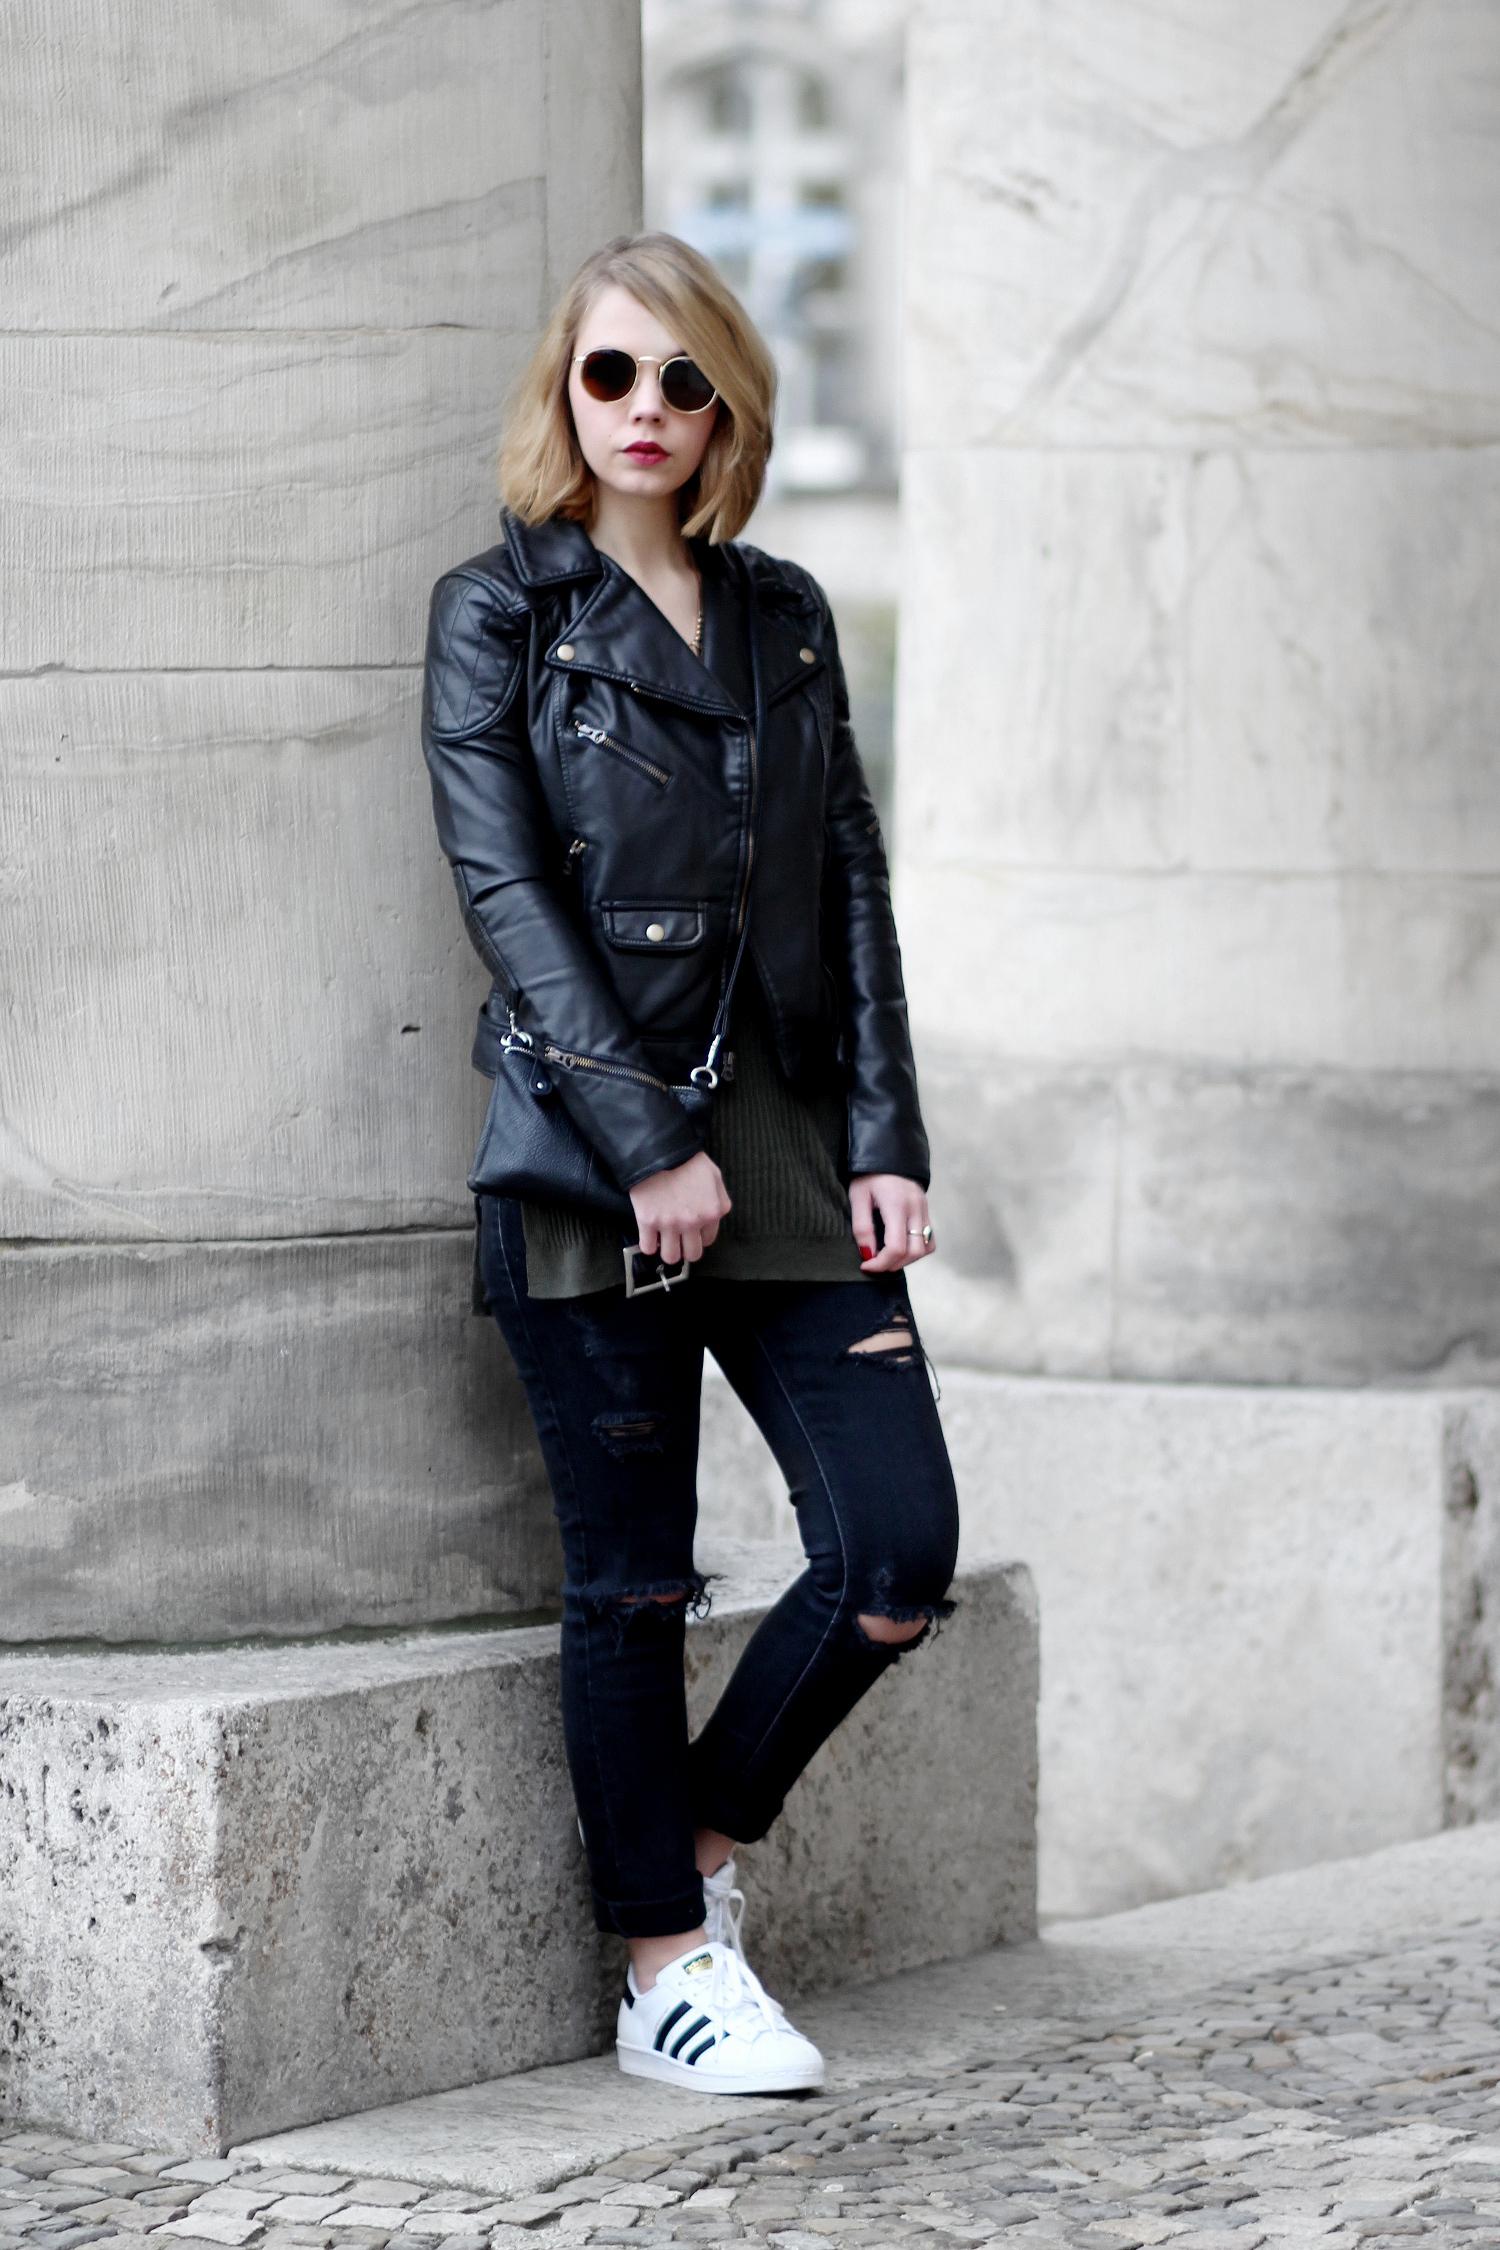 bezauberndenana-fashionblog-casual-outfit-lederjacke-ralphlauren-ripped-jeans-adidas-superstars-streetstyle-lässig (7)